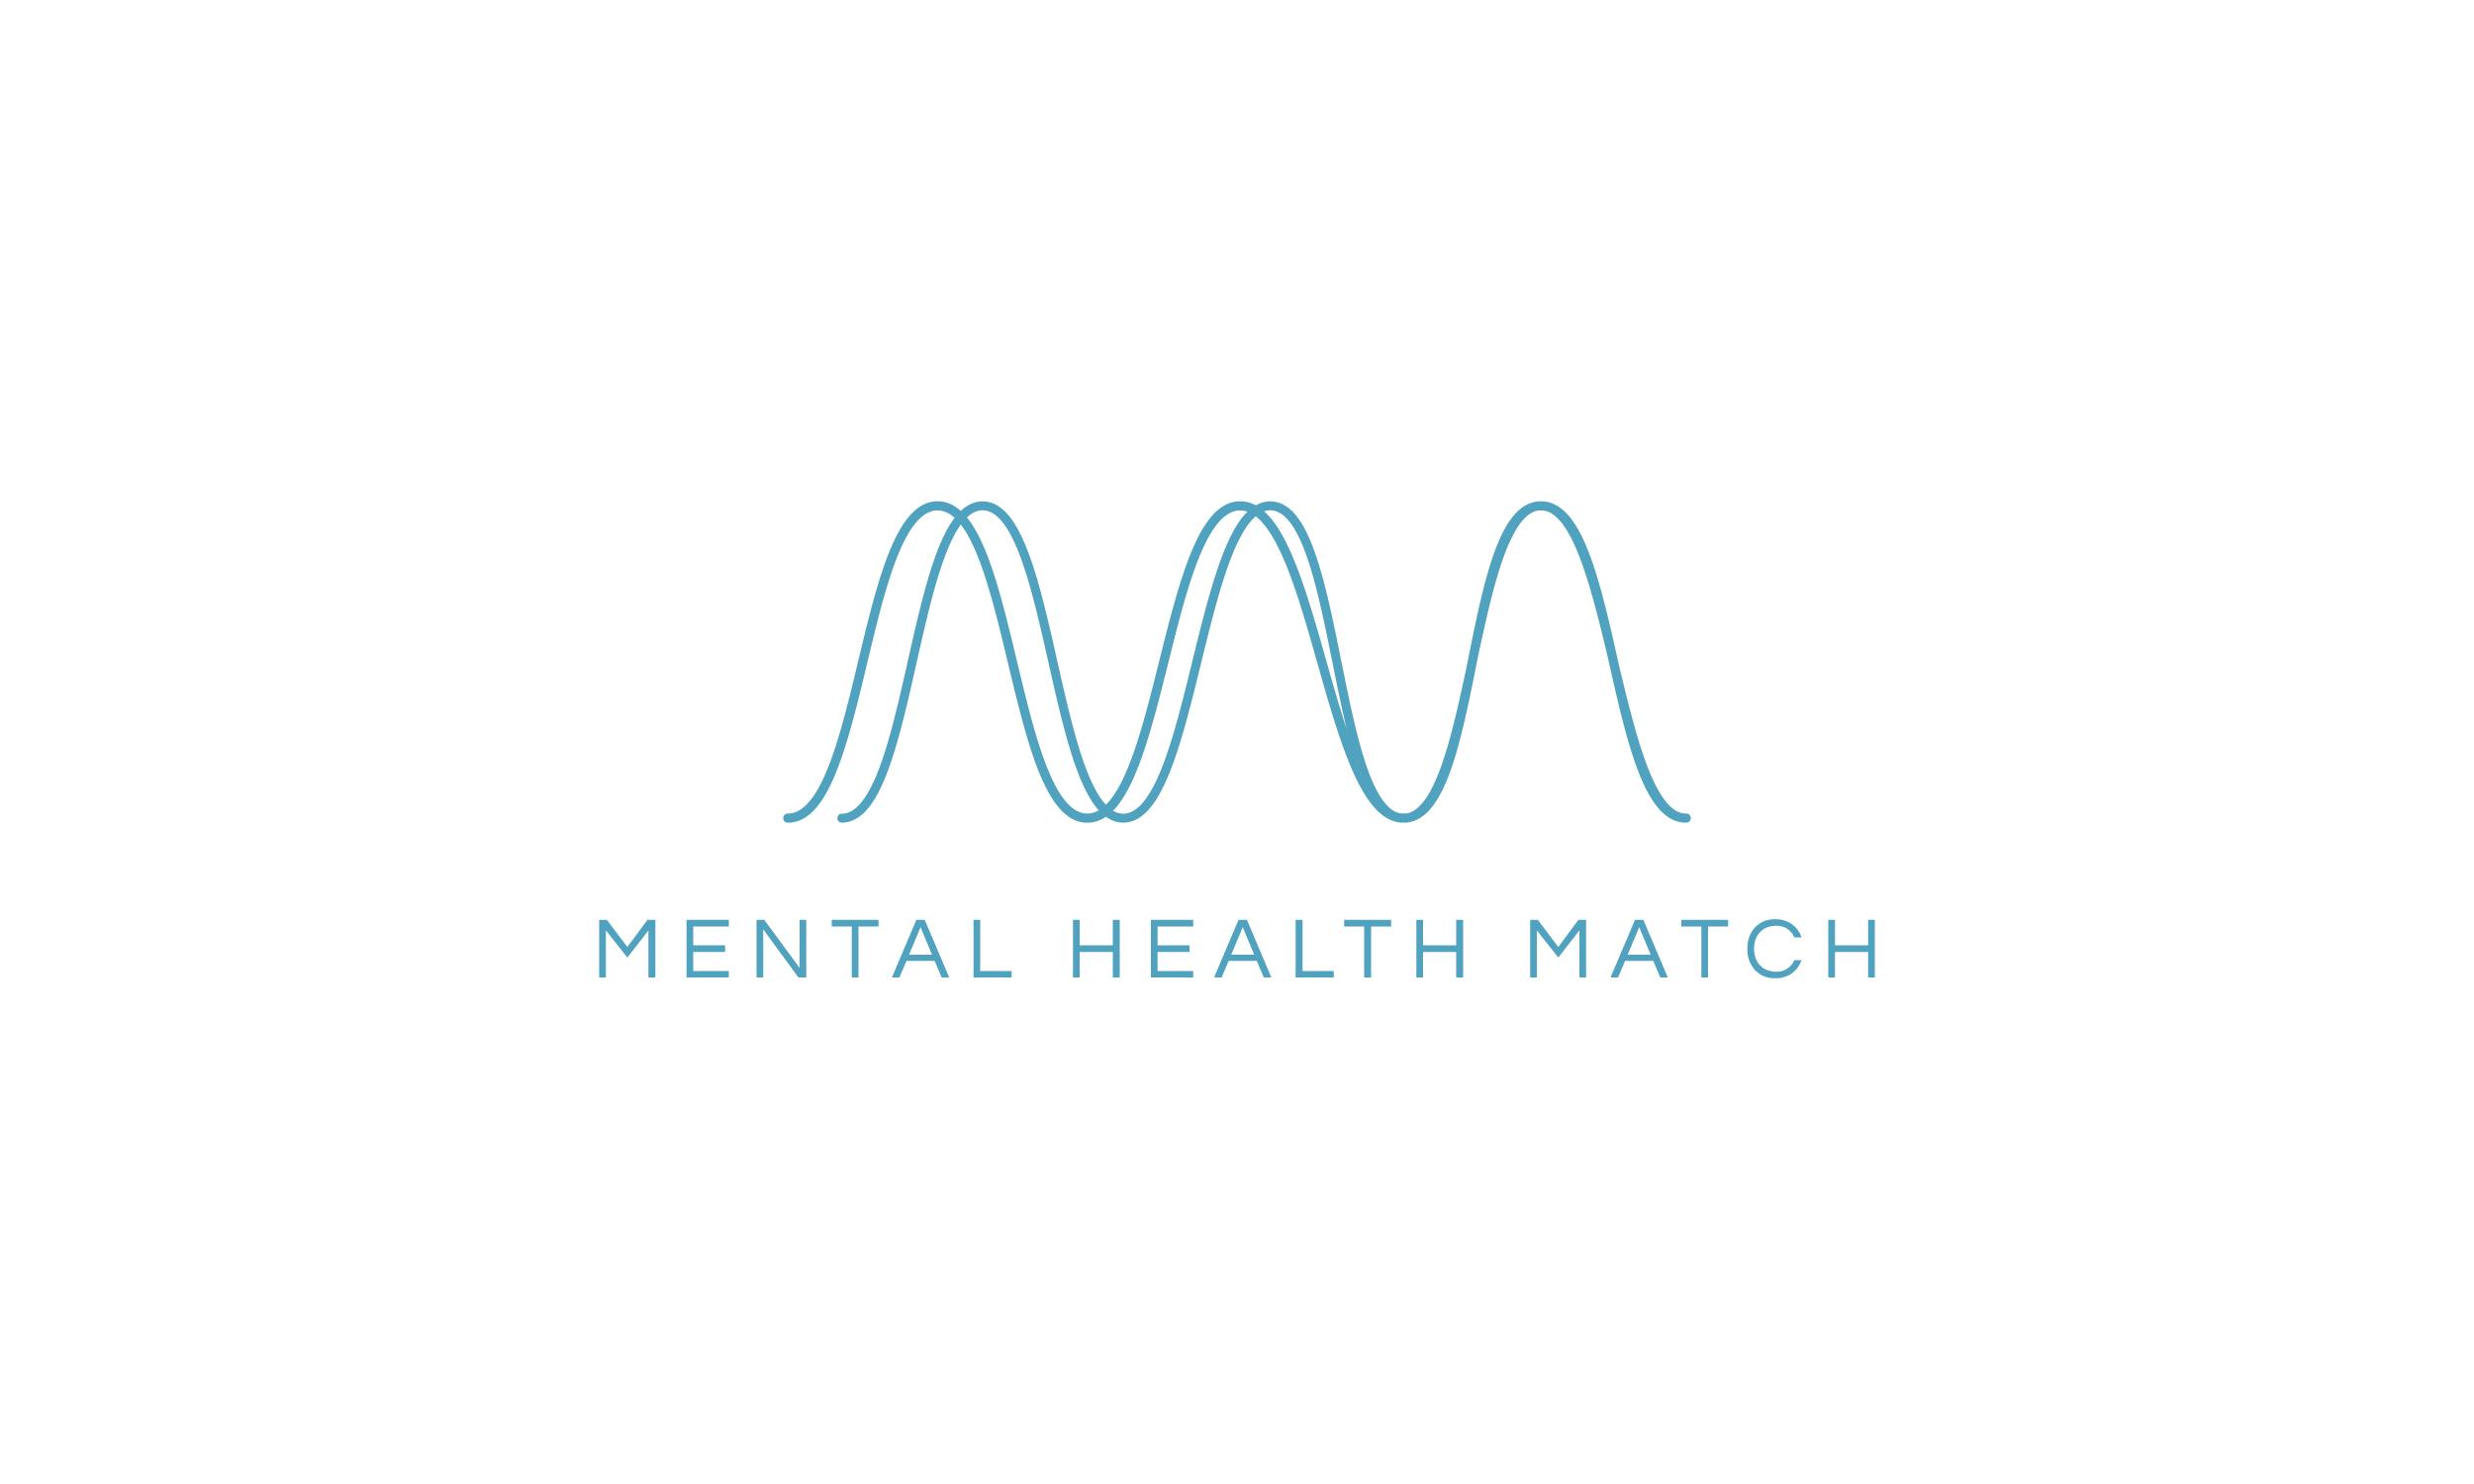 Mental_Health_Match_Logo_Blue_2500x1500.jpg